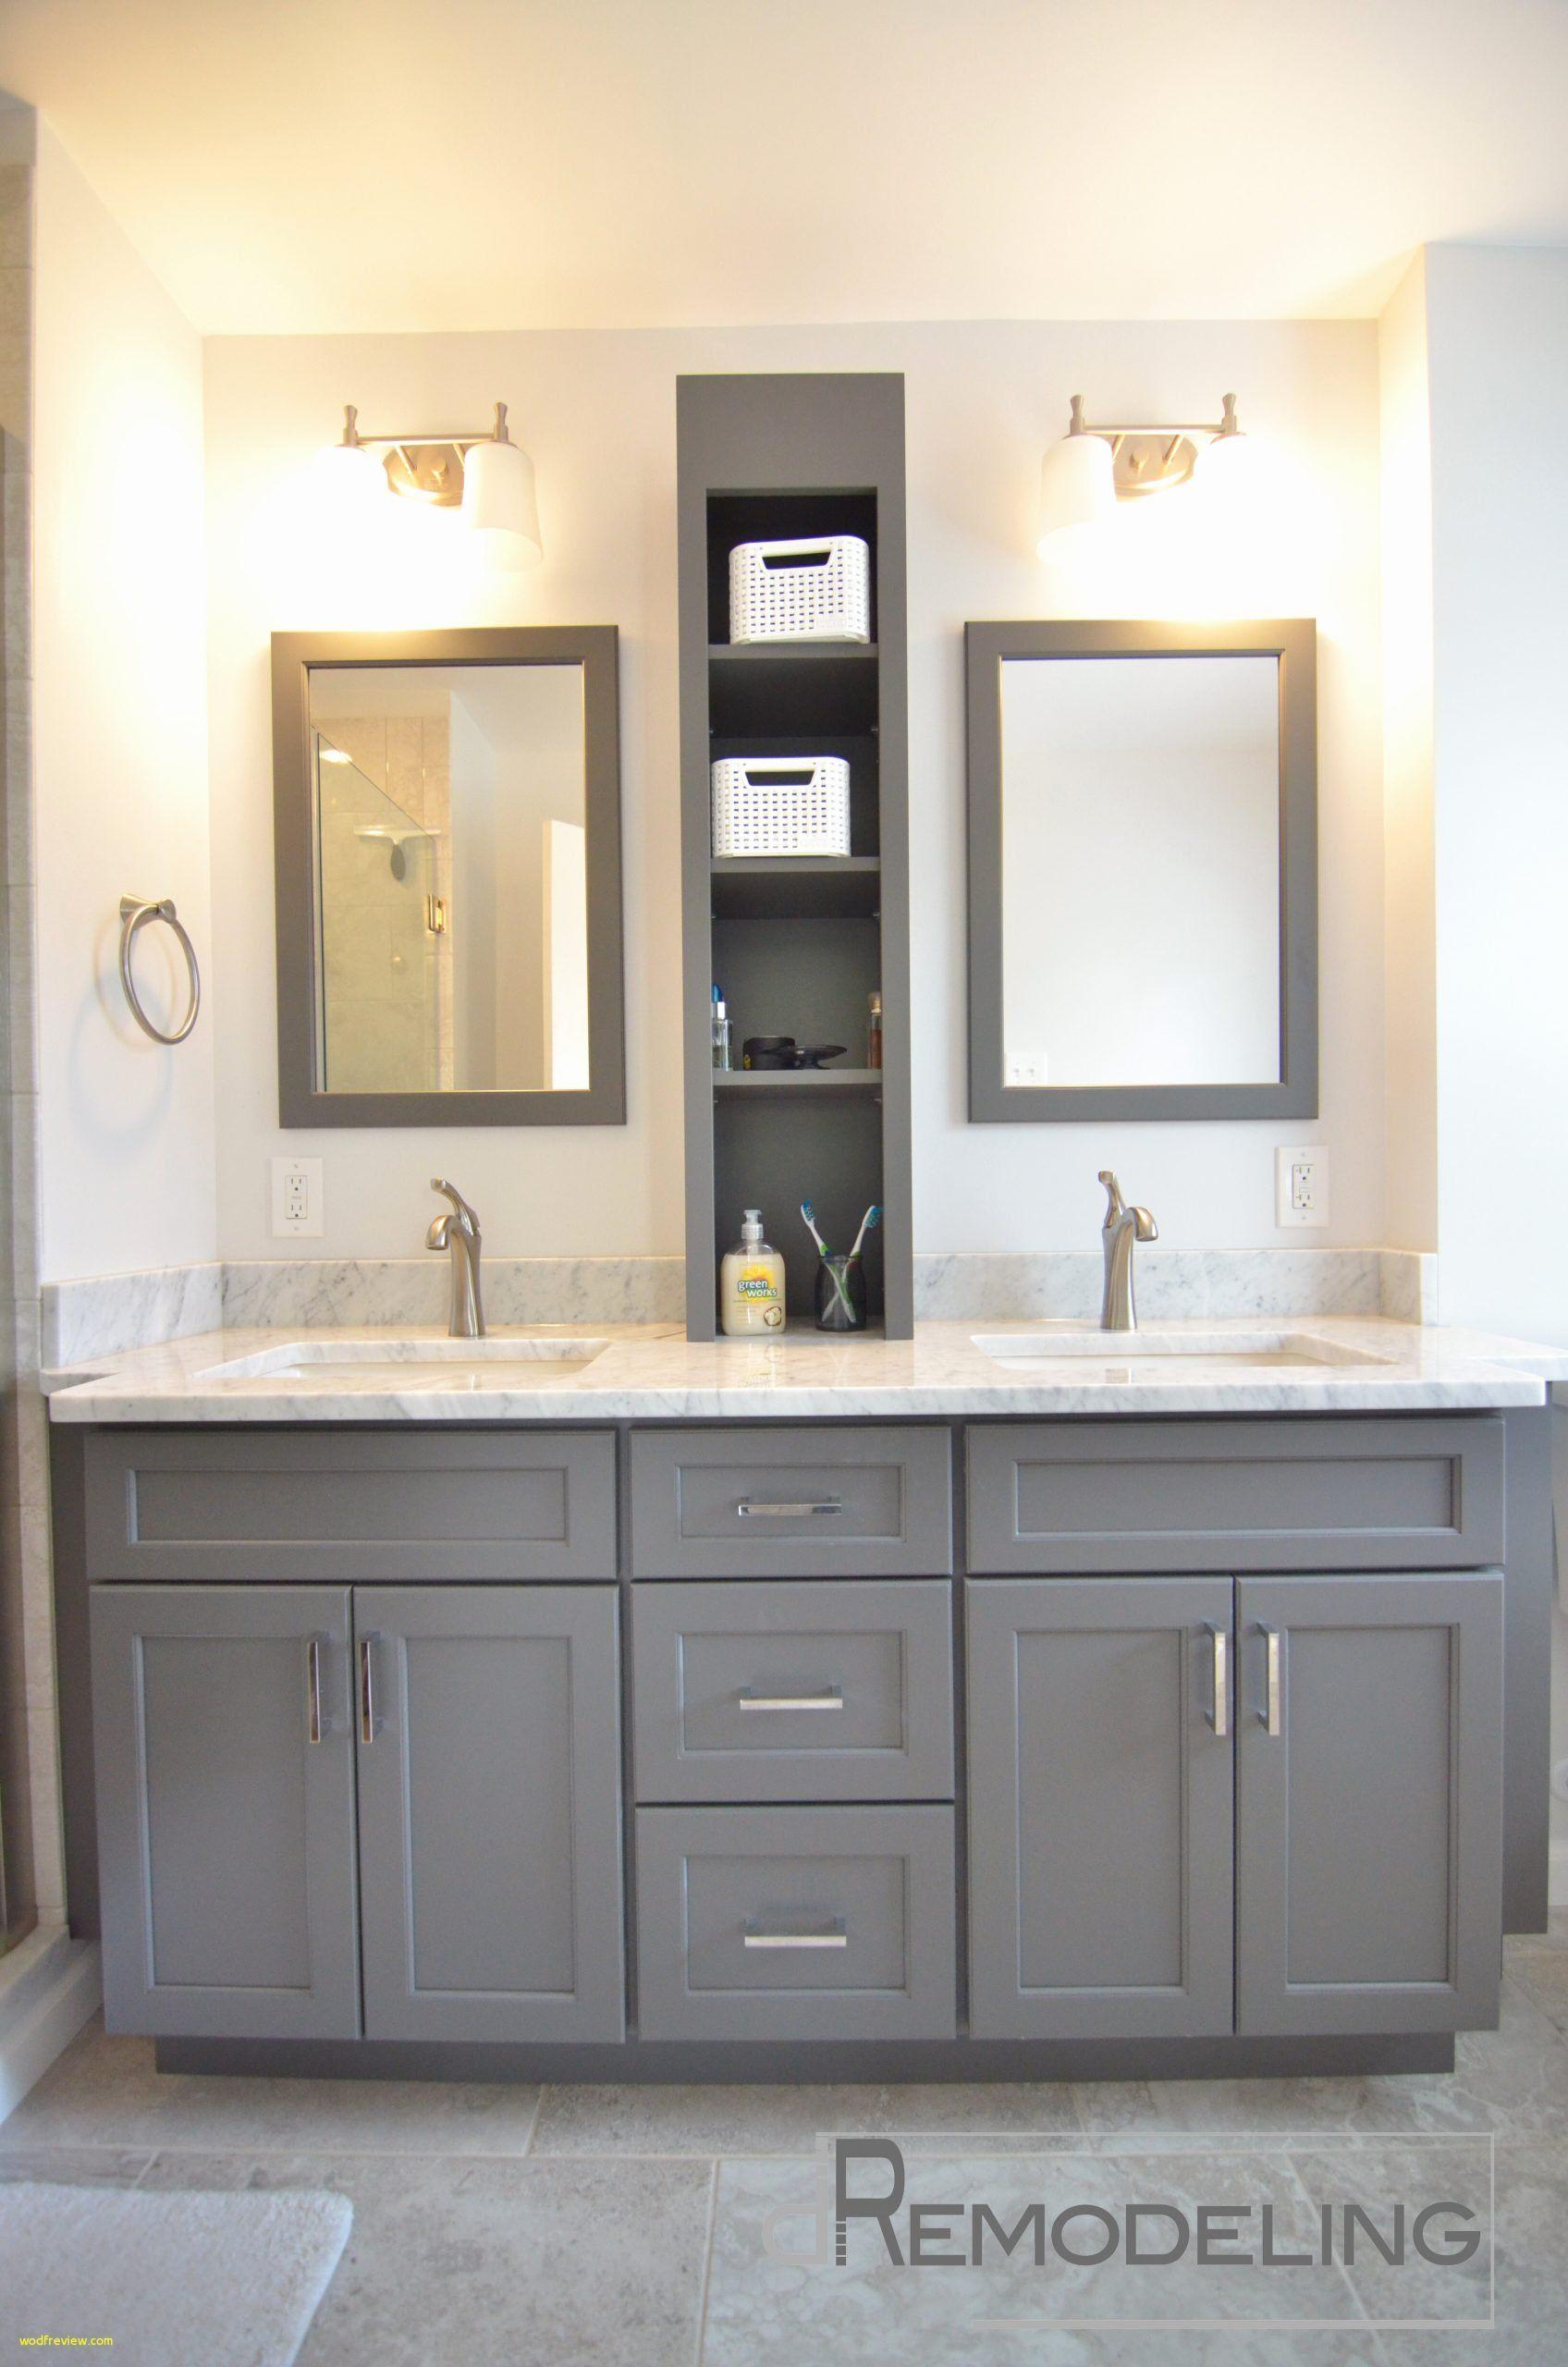 Bathroom Vanity Mirror Ideas Unique Diy Bathroom Vanity Ideas Pinterest Inspirational D In 2020 Double Vanity Bathroom Beautiful Bathroom Cabinets Double Sink Bathroom